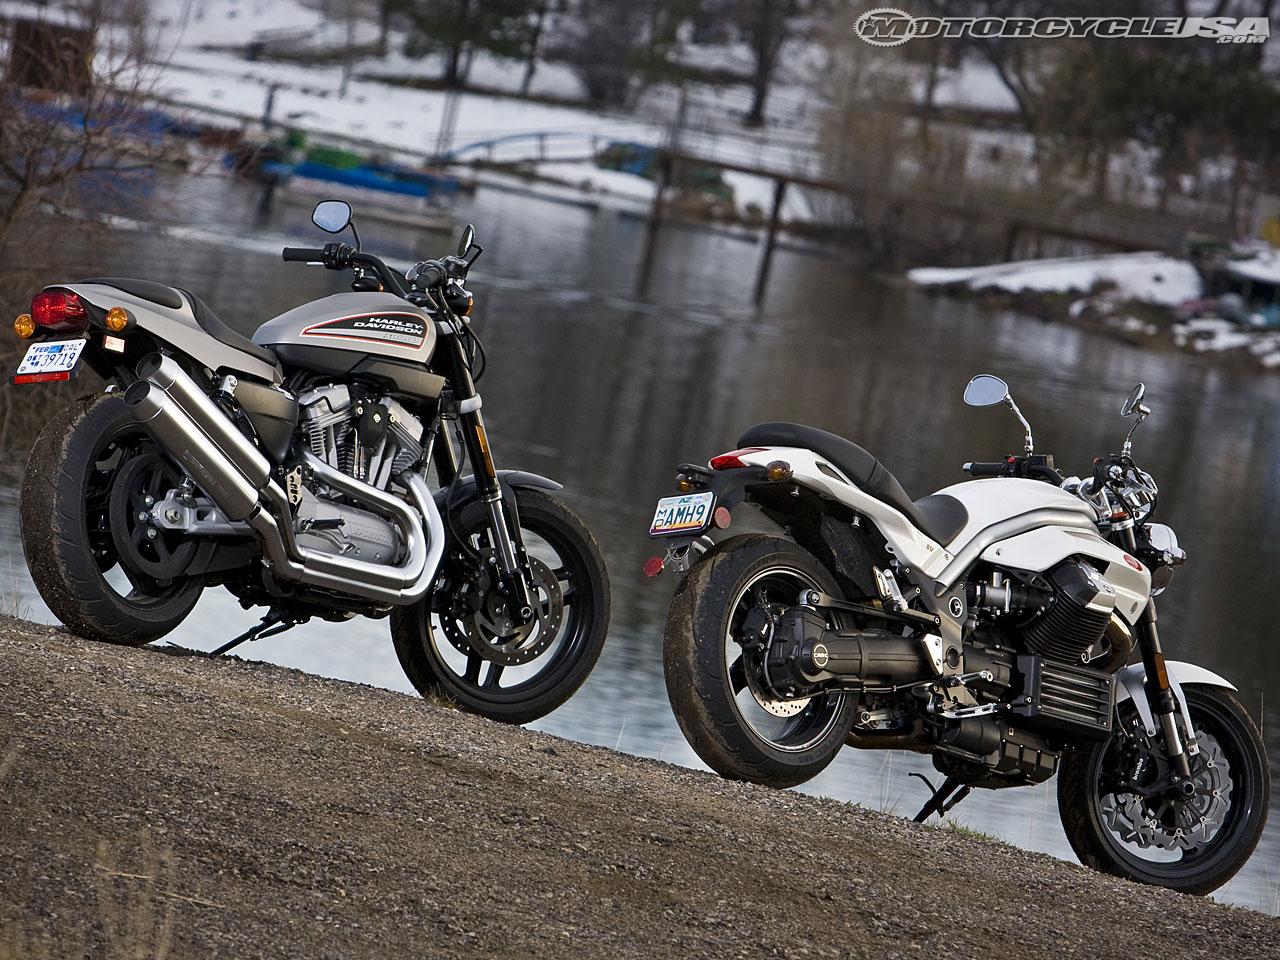 moto guzzi wallpaper (Moto Guzzi Griso)